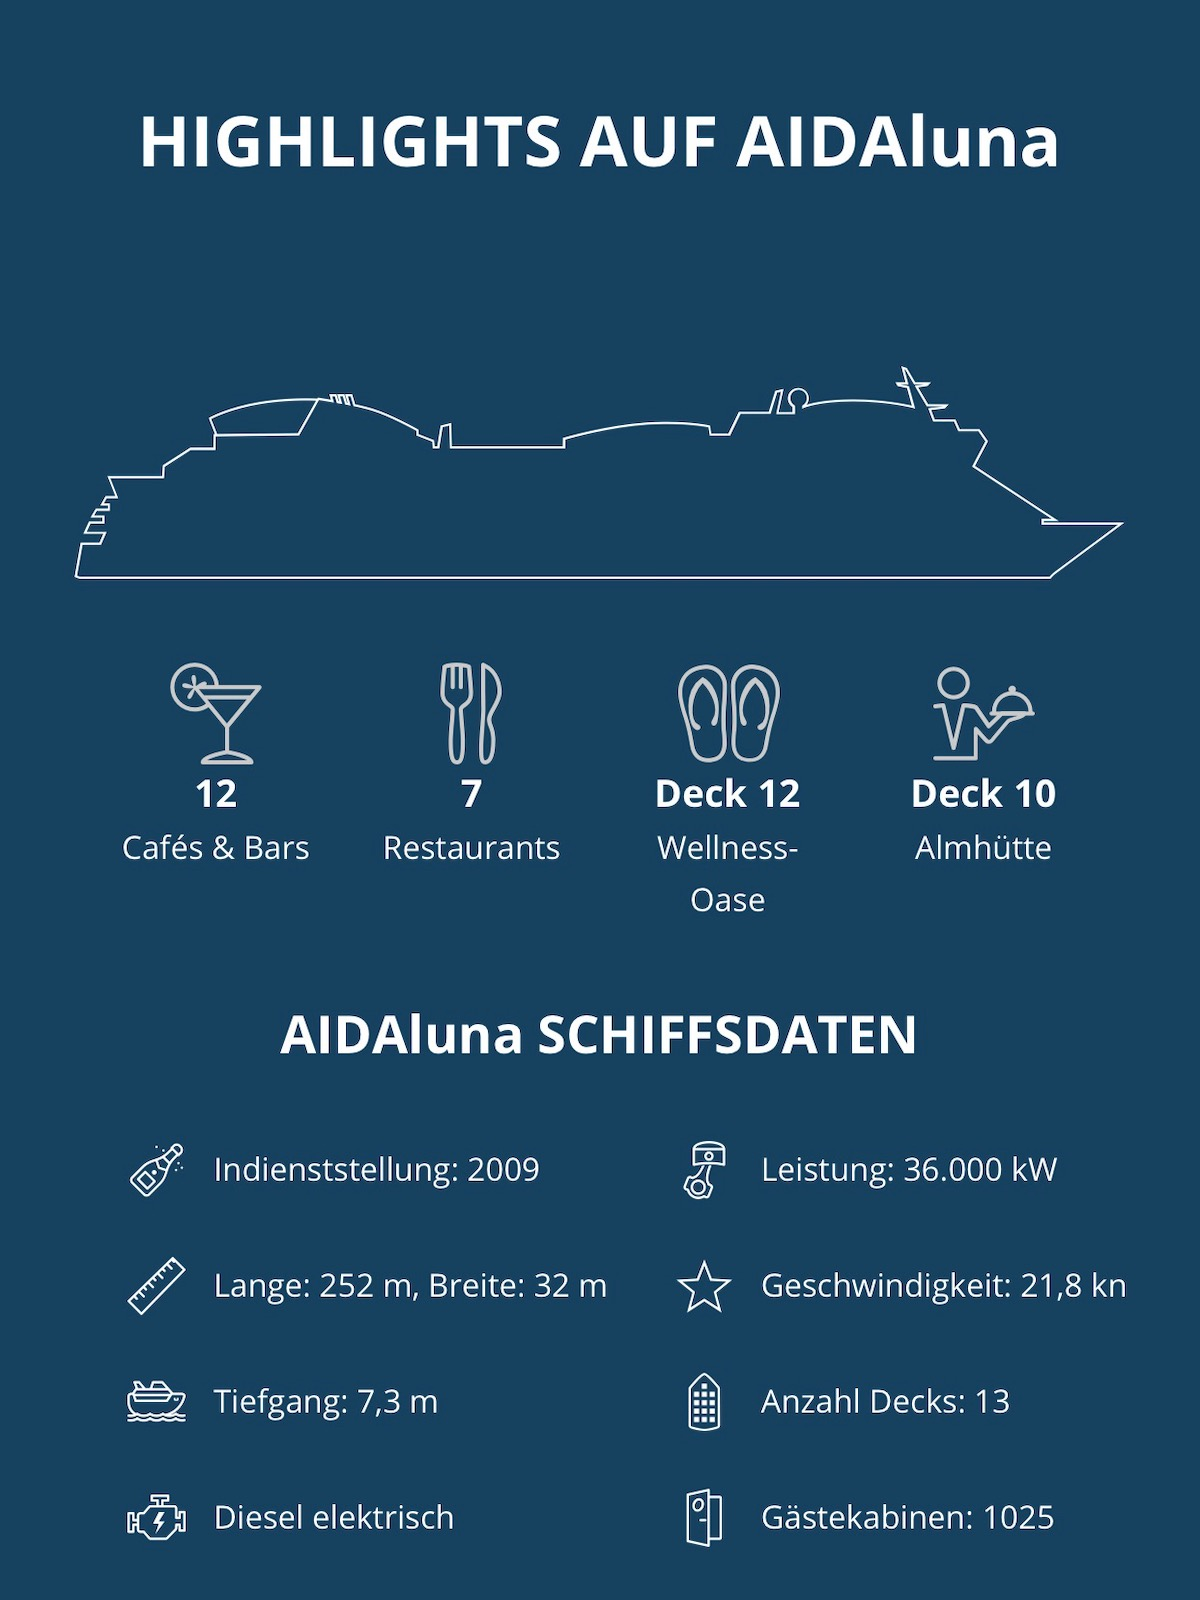 aida-cruises-ships-aidaluna-daten-mobil